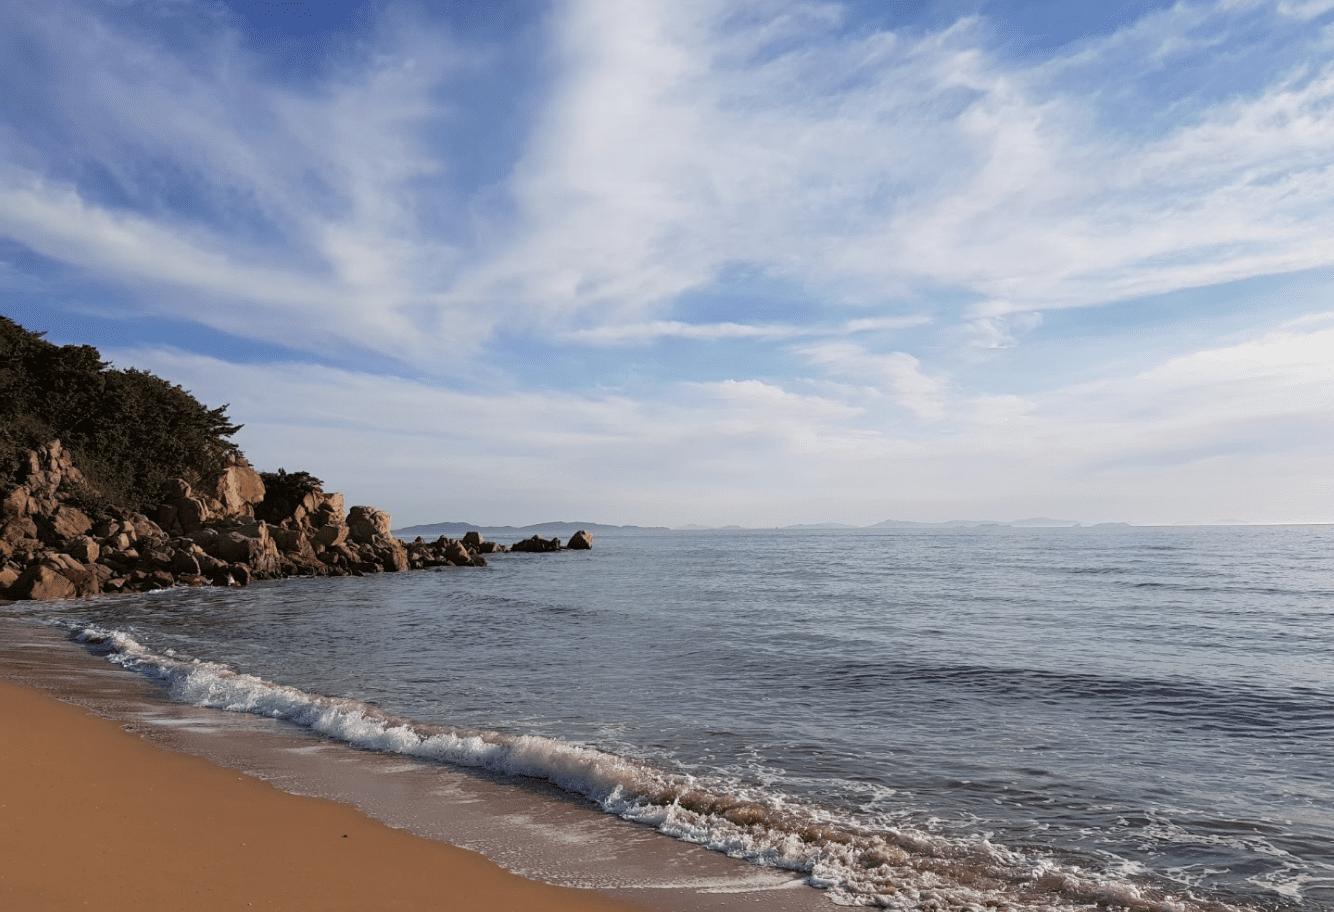 Hanagae Beach | Muui Island, Incheon